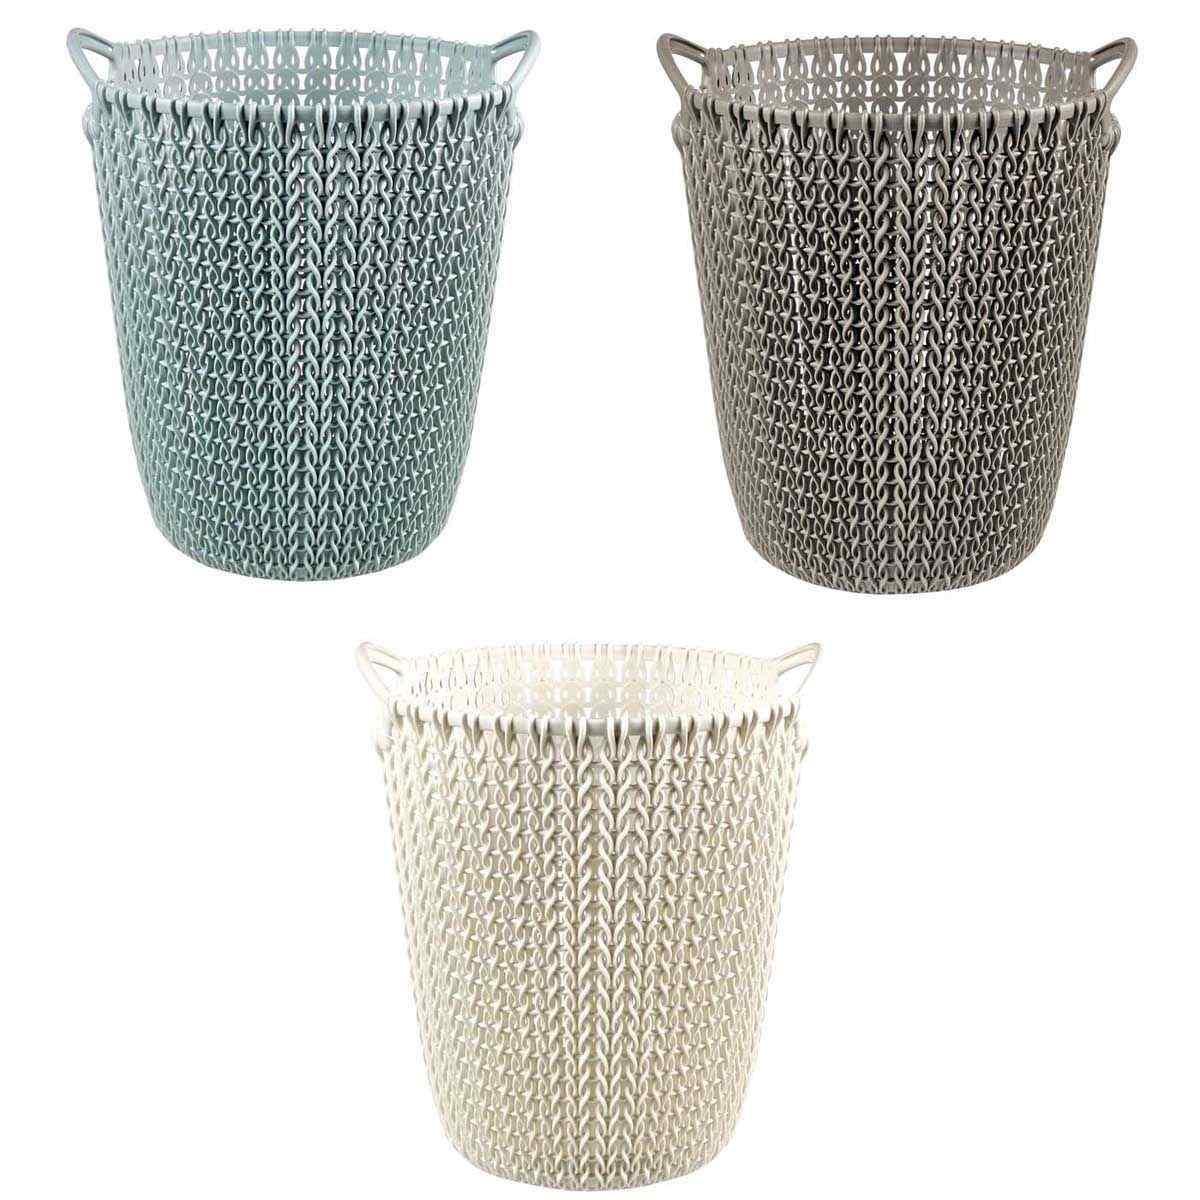 Curver Knit Collection 7Lt Plastic Kitchen Office Waste Paper Basket  Rubbish Bin